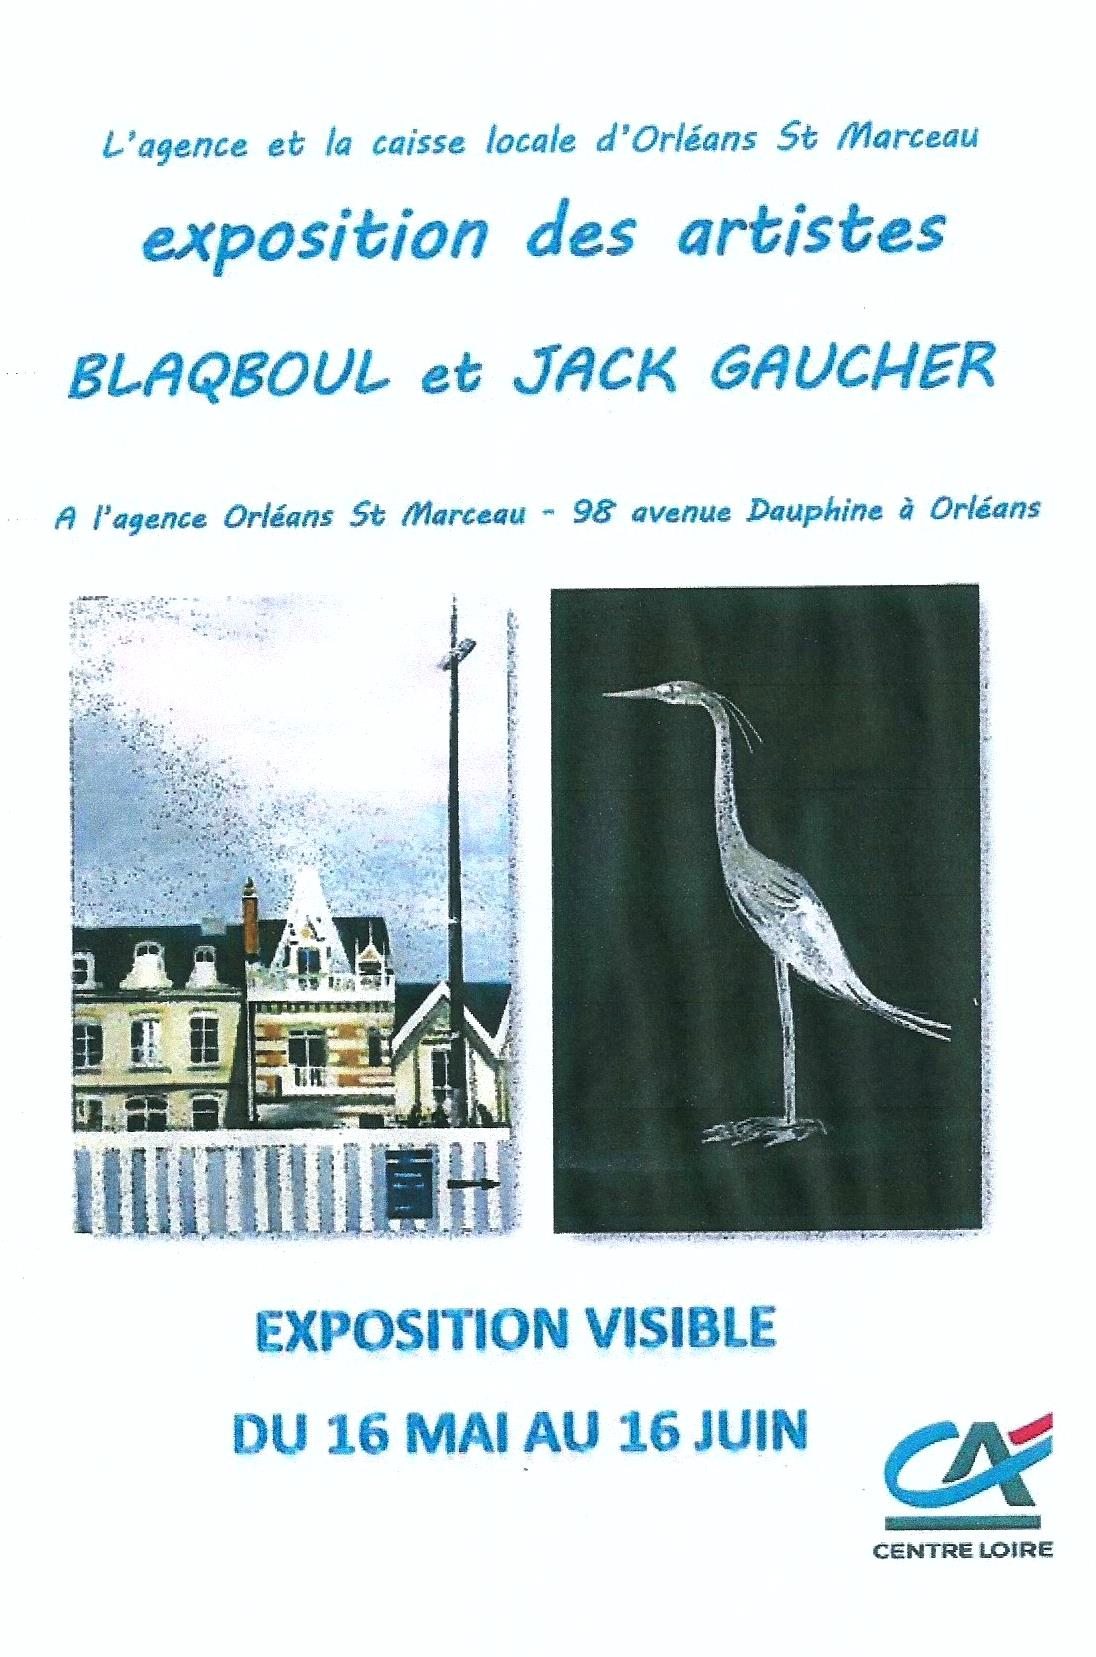 Scan Exposition des artistes Blaqboul et Jack Gaucher CA 2017.jpg